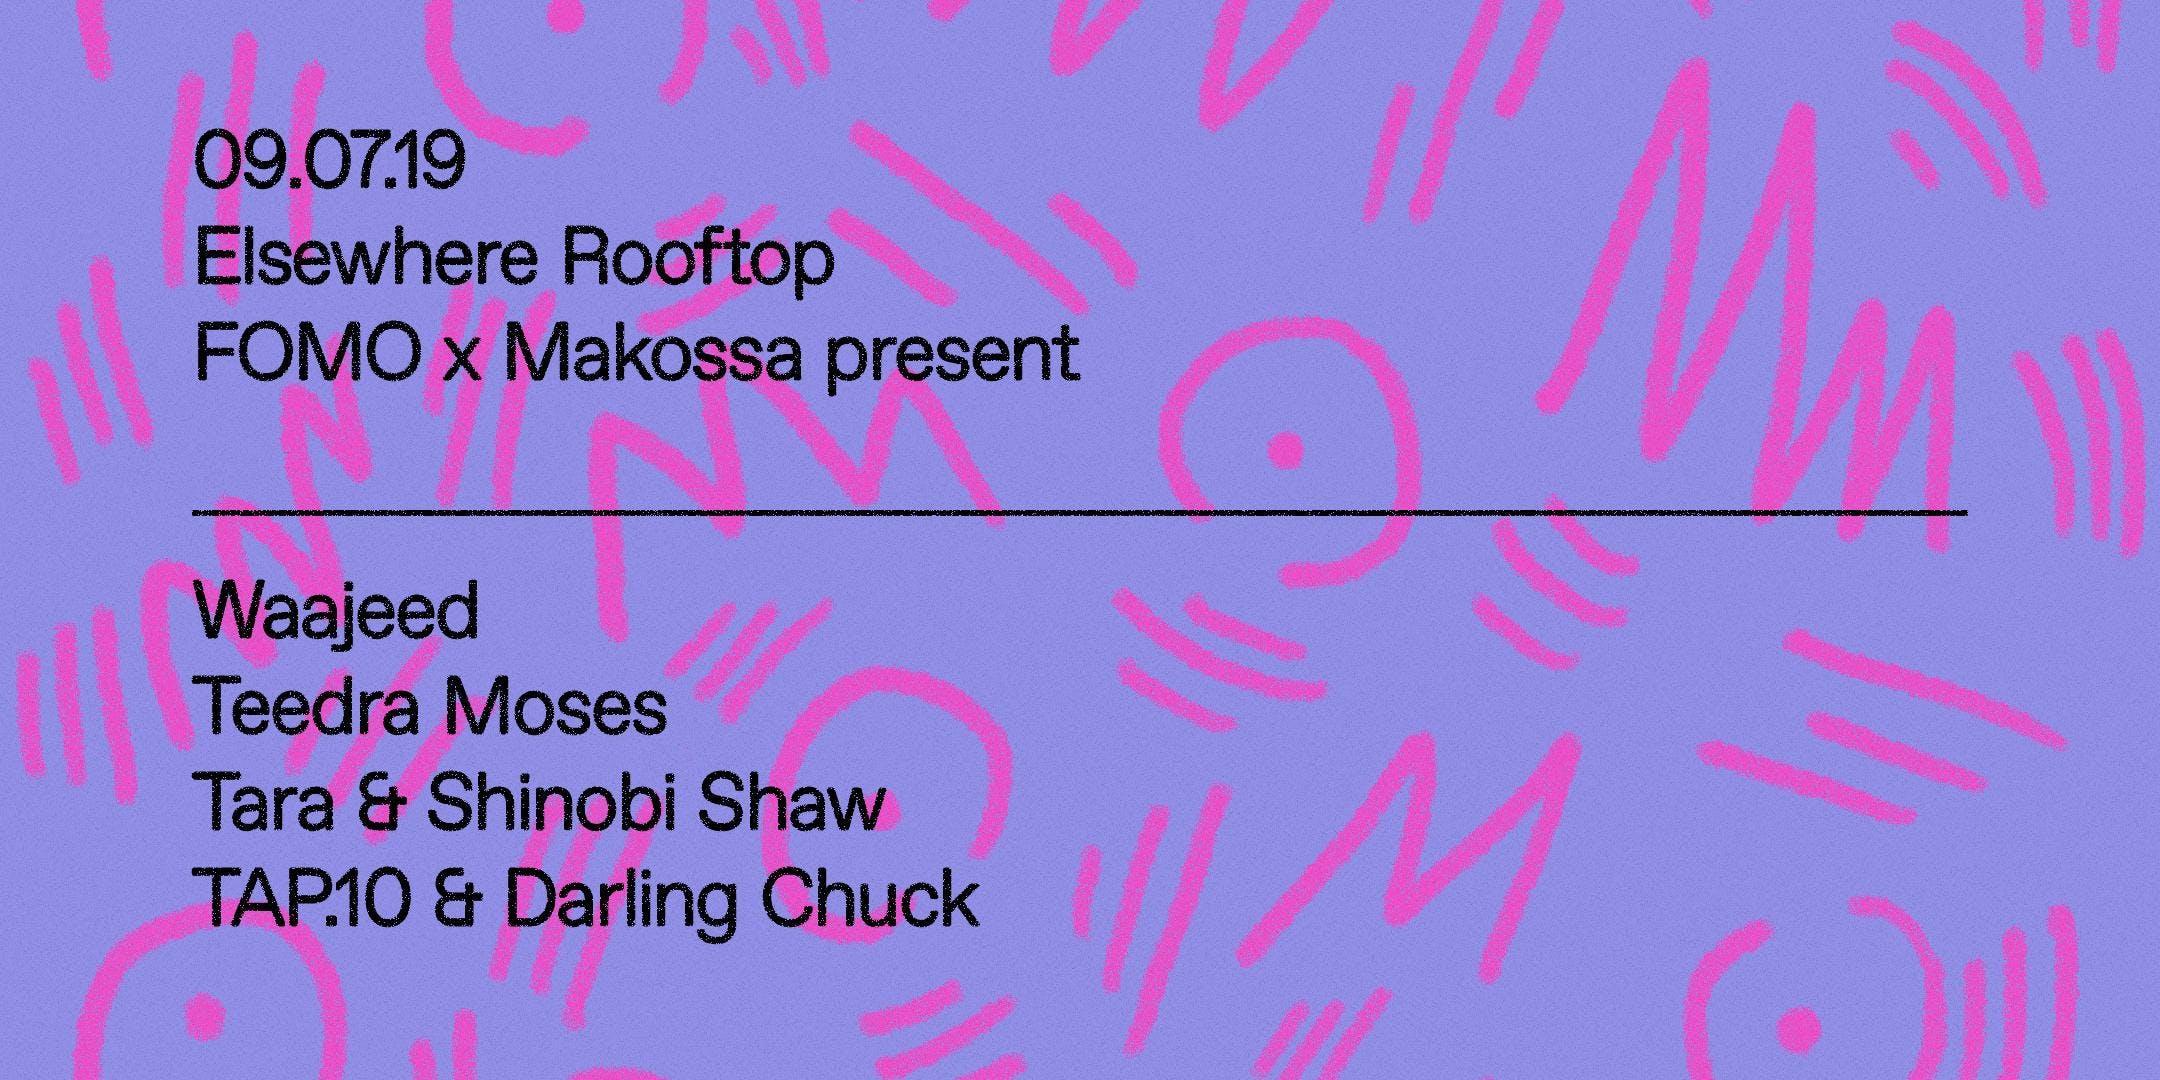 FOMO x Makossa Present: Waajeed, Teedra Moses, Darling Chuck, Tara, Shinobi Shaw & TAP.10